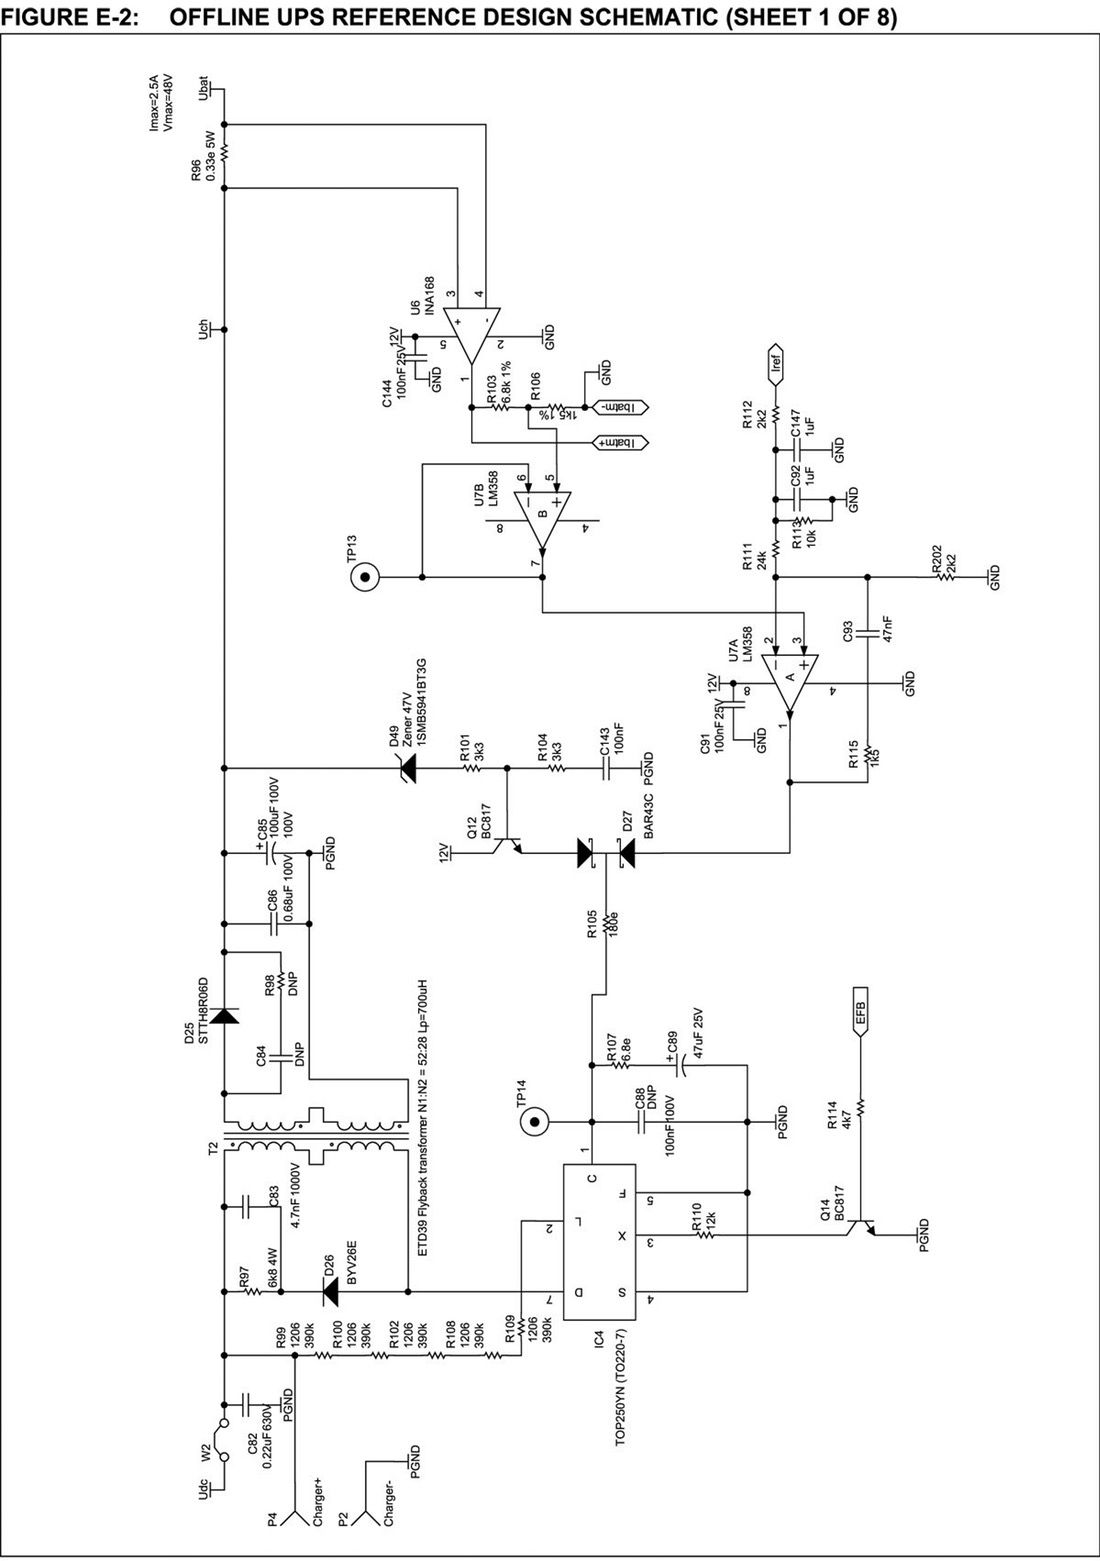 Pin By Diagram Bacamajalah On Wiring Samples Schematic Drawing